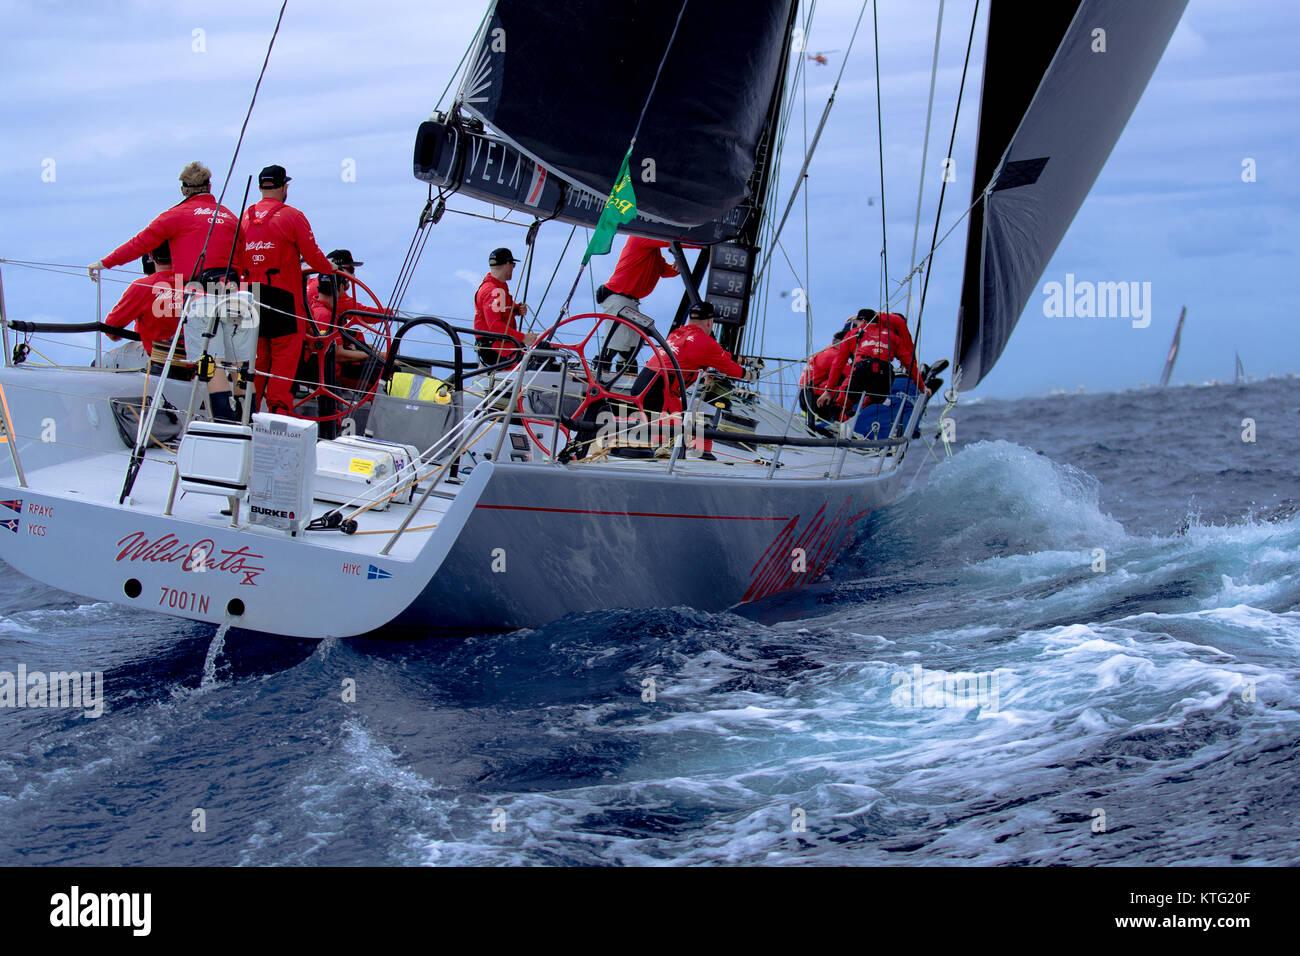 Sydney, Australia. 26th December 2017. Rolex Sydney to Hobart Yacht Race 2017. Wild Oats X has seen a lot of miles - Stock Image